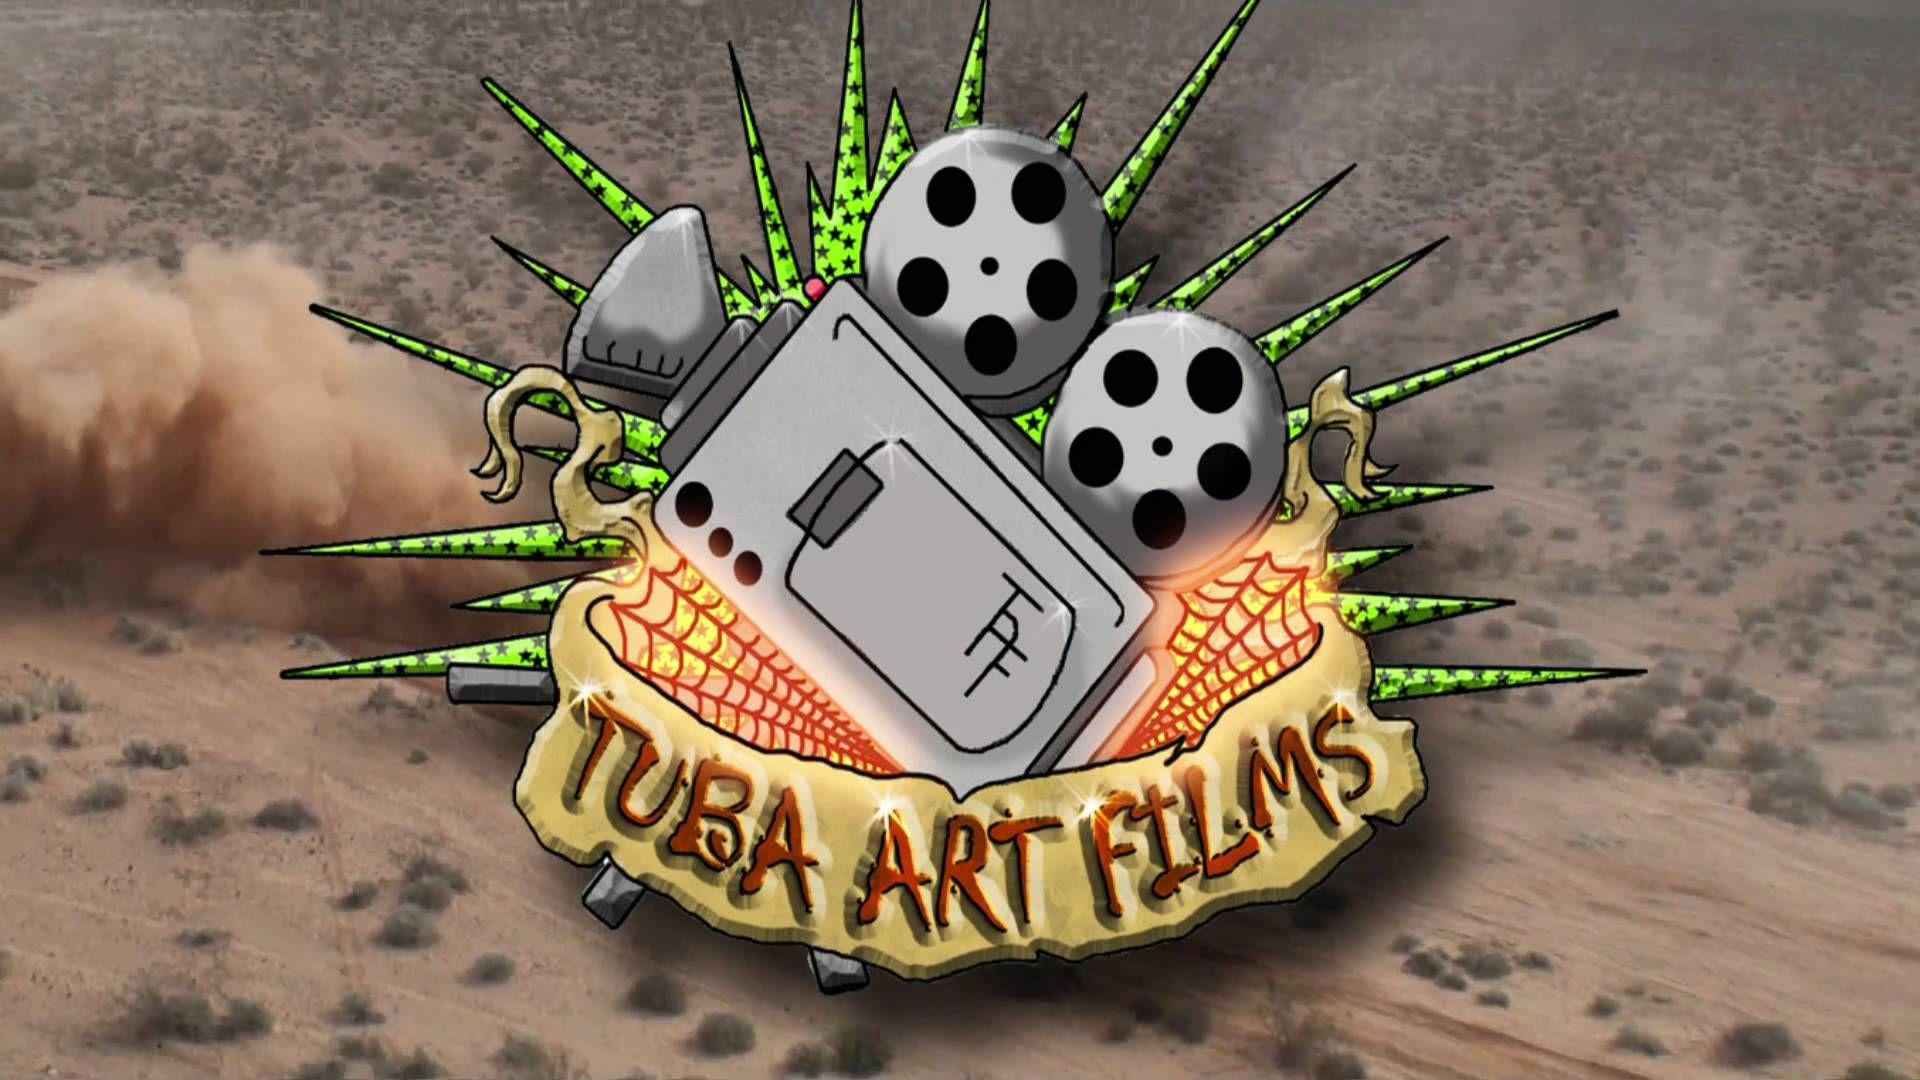 tuba art films Christmas ornaments, Art, Christmas